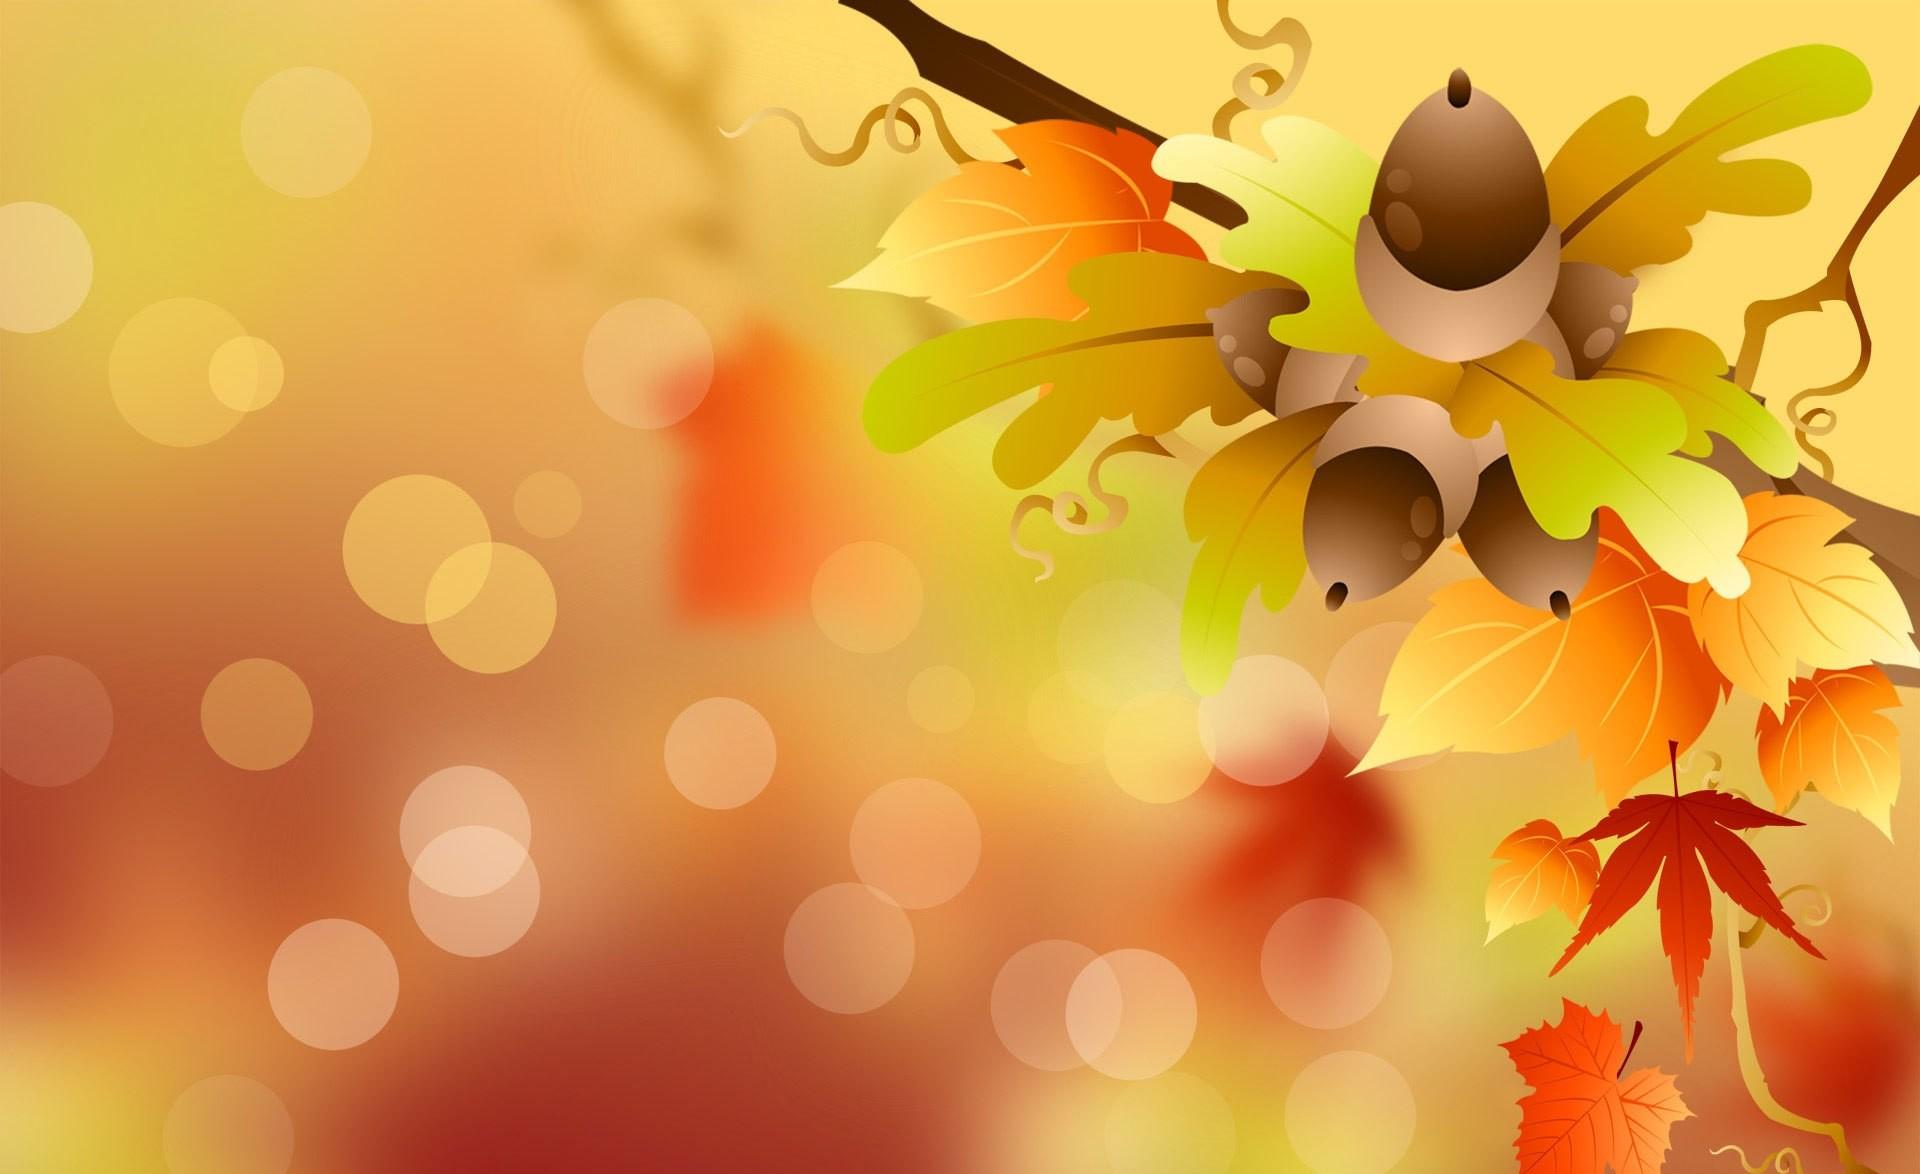 Cute Fall Wallpaper Backgrounds (60+